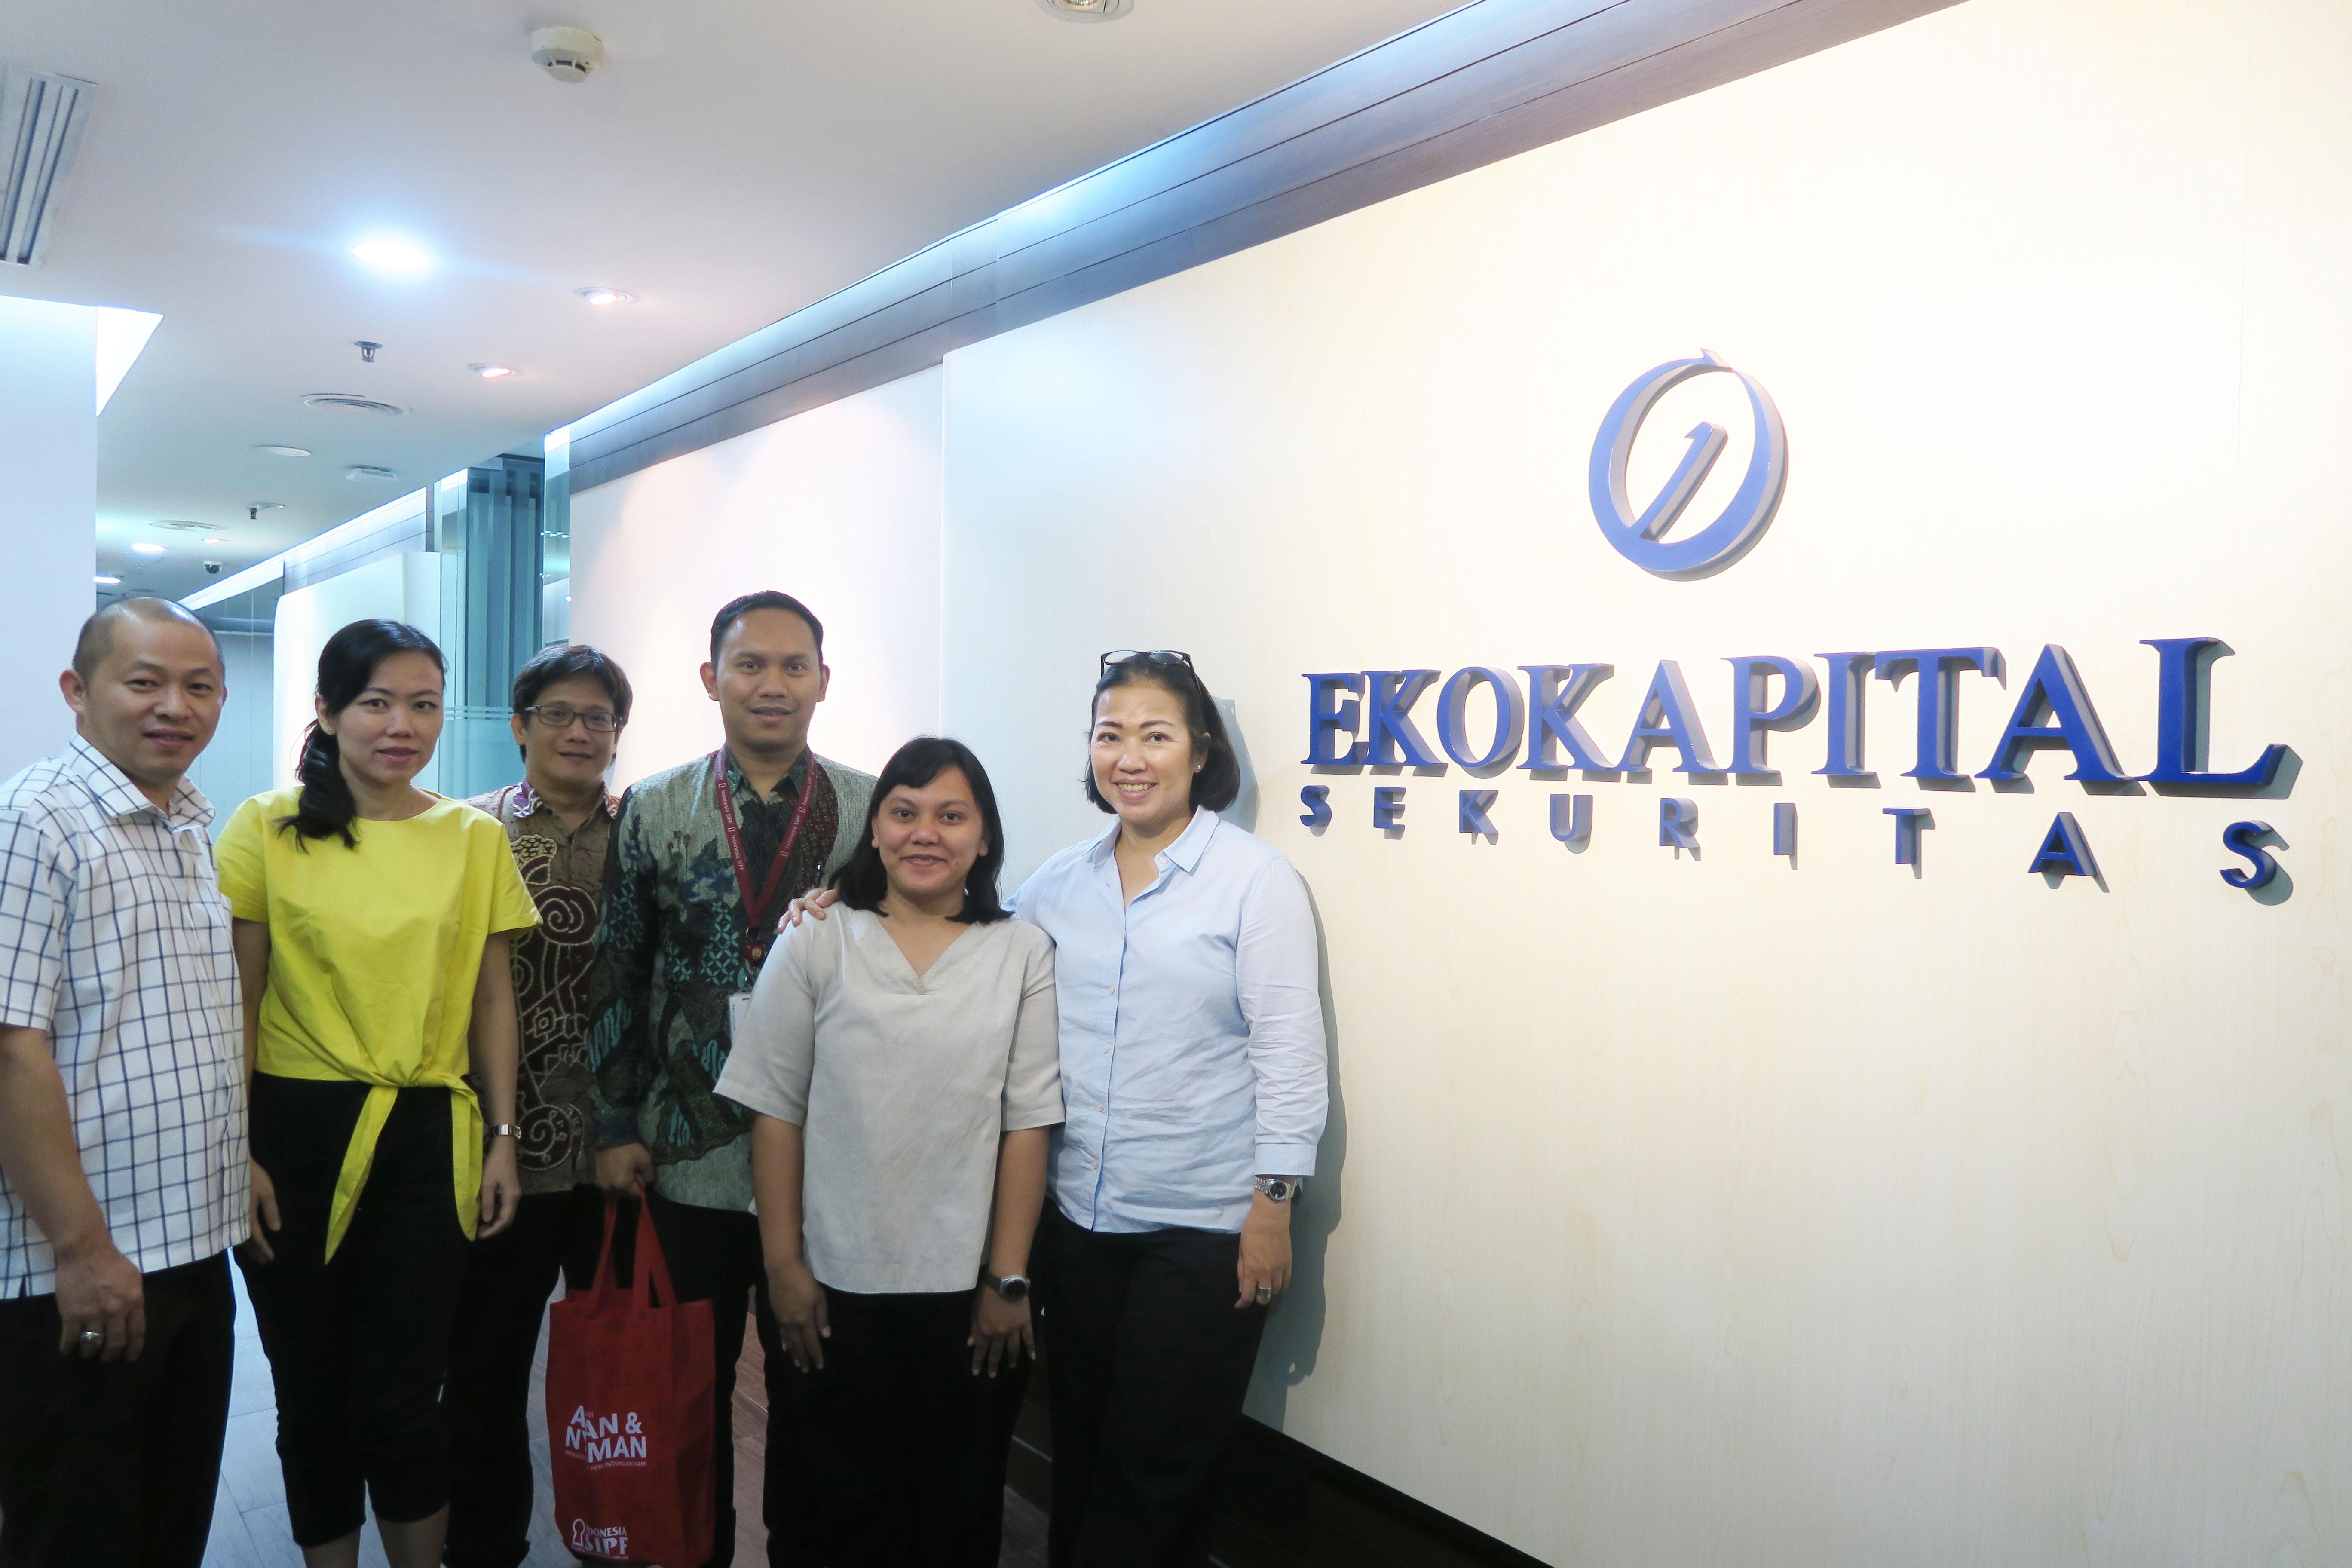 Kunjungan ke PT Ekokapital Sekuritas dalam Rangka Sosialisasi Dana Perlindungan Pemodal